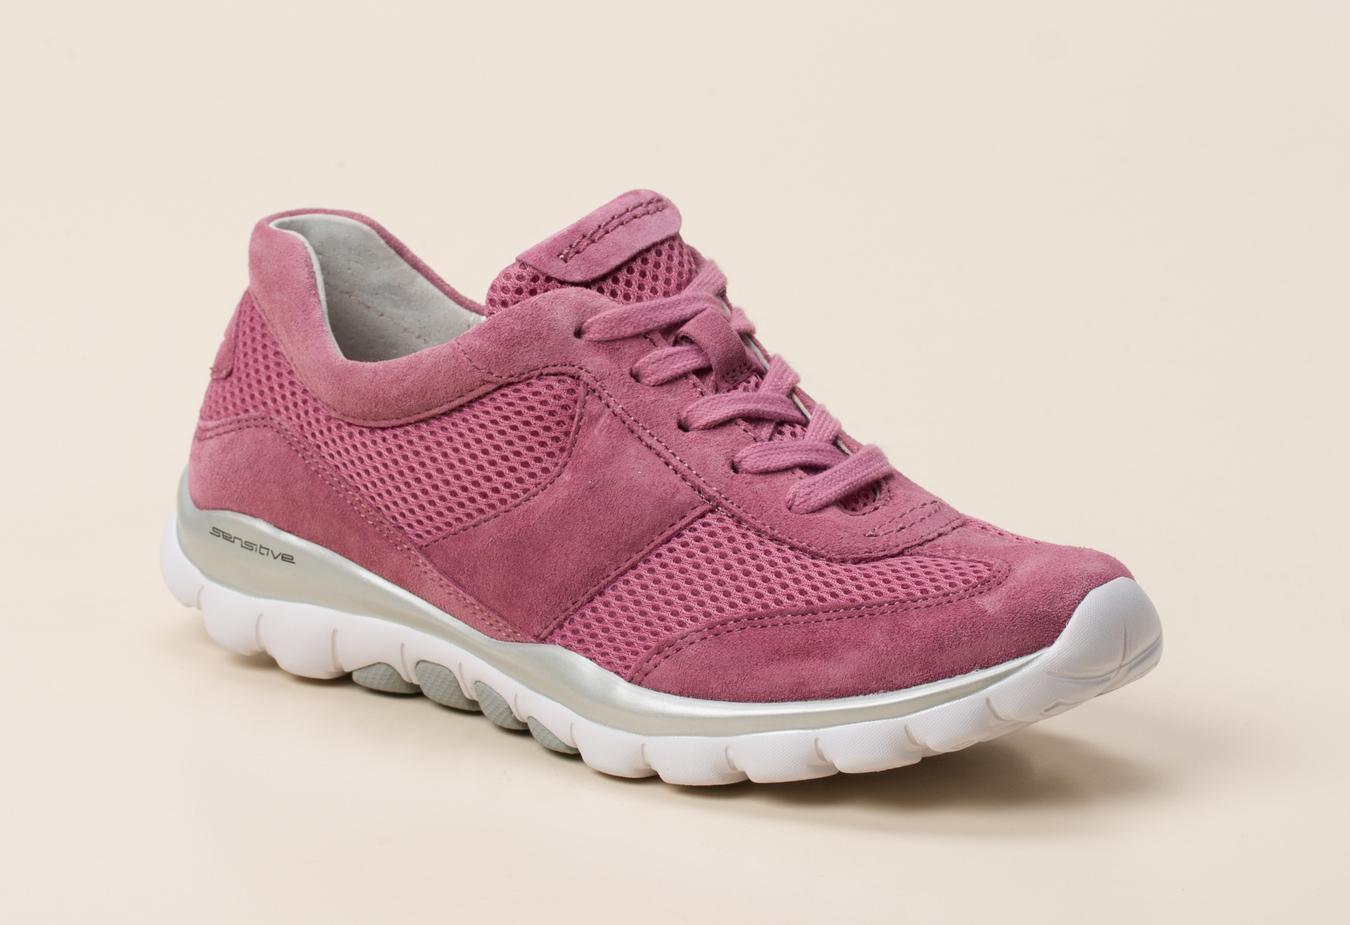 best website af239 40e96 Gabor Comfort Damen Sneaker in pink kaufen | Zumnorde Online-Shop